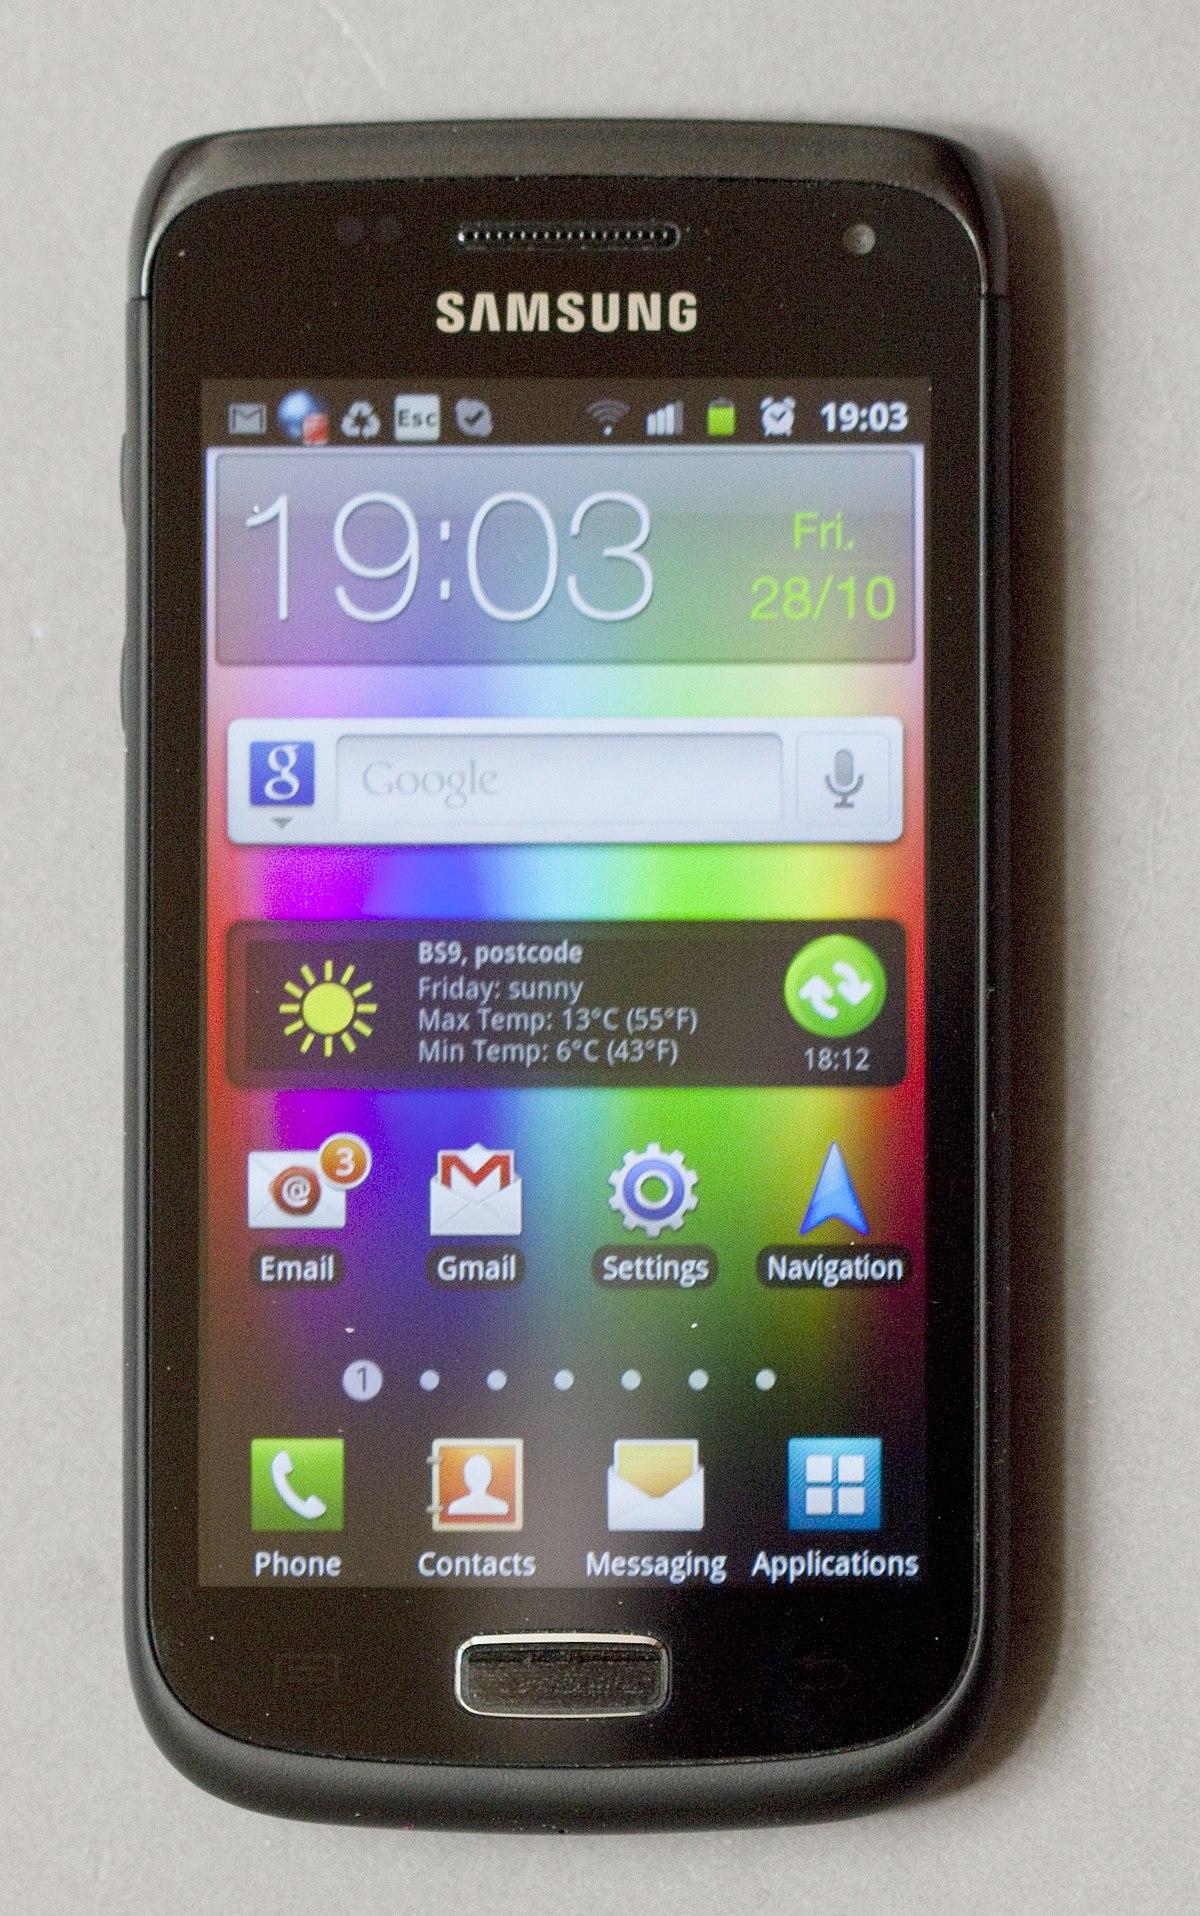 Samsung Galaxy W - Wikipedia